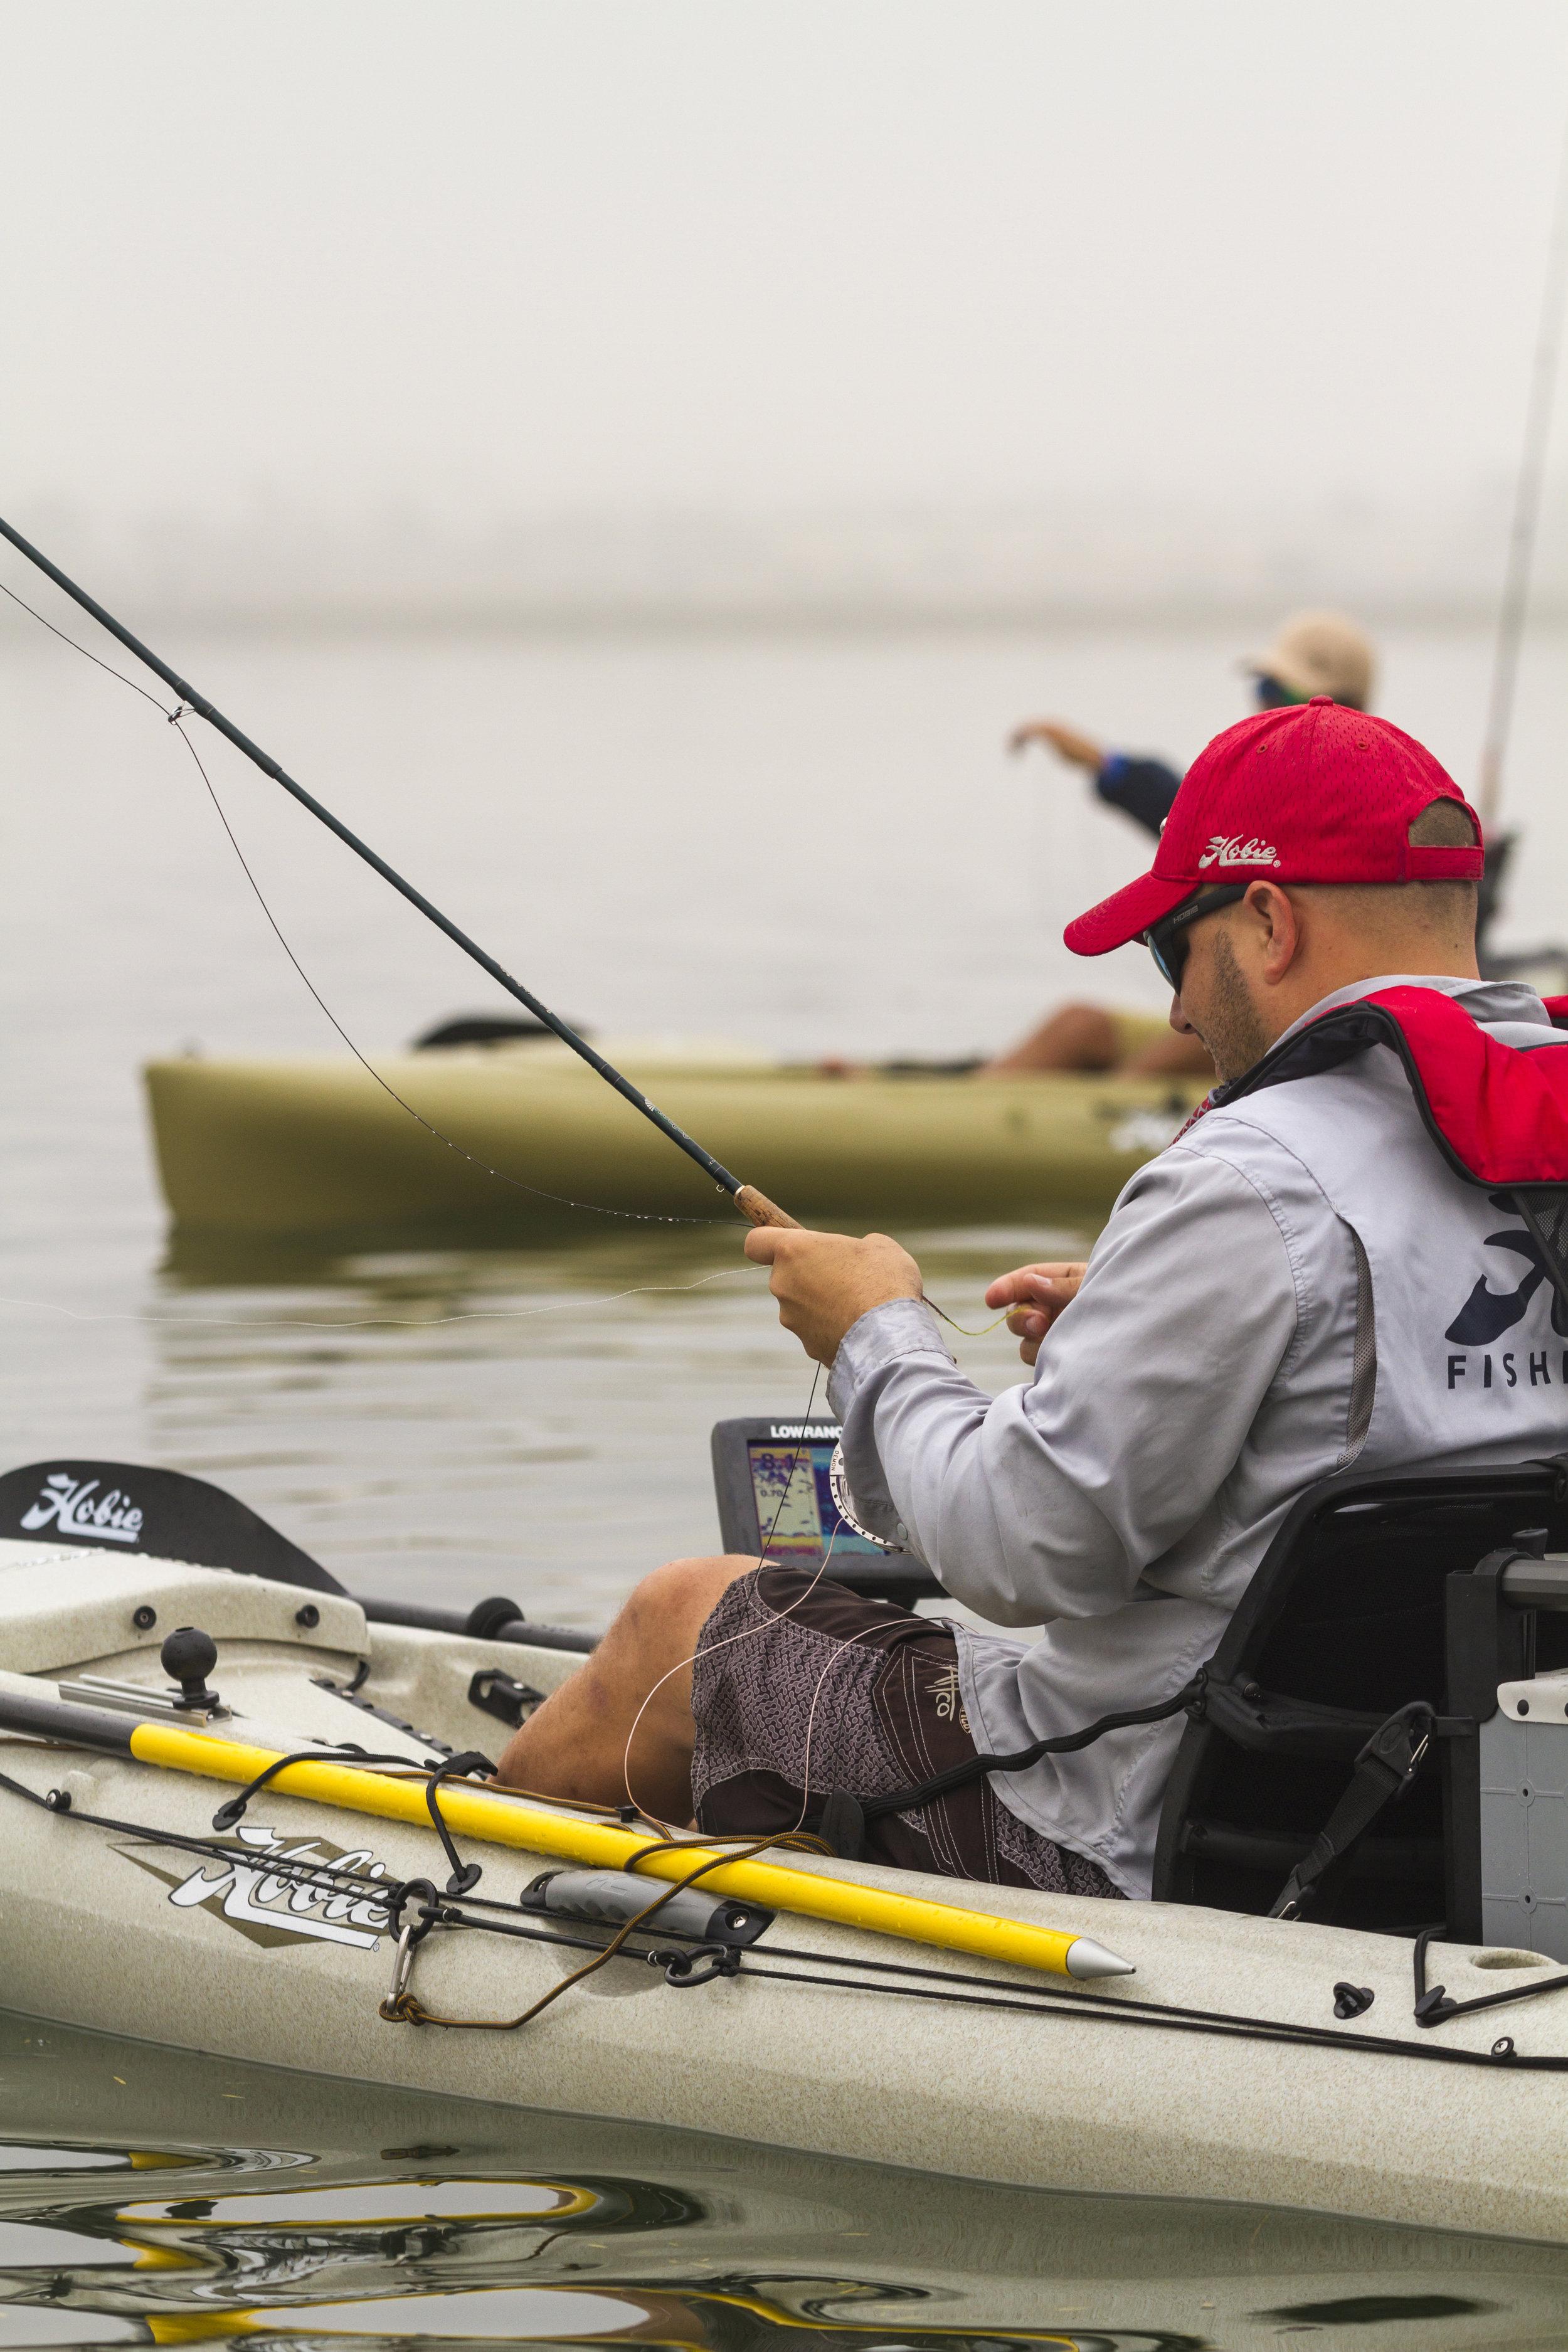 Quest13_fishing_foggy_Shane_Dune_Tying_9020_full.jpg